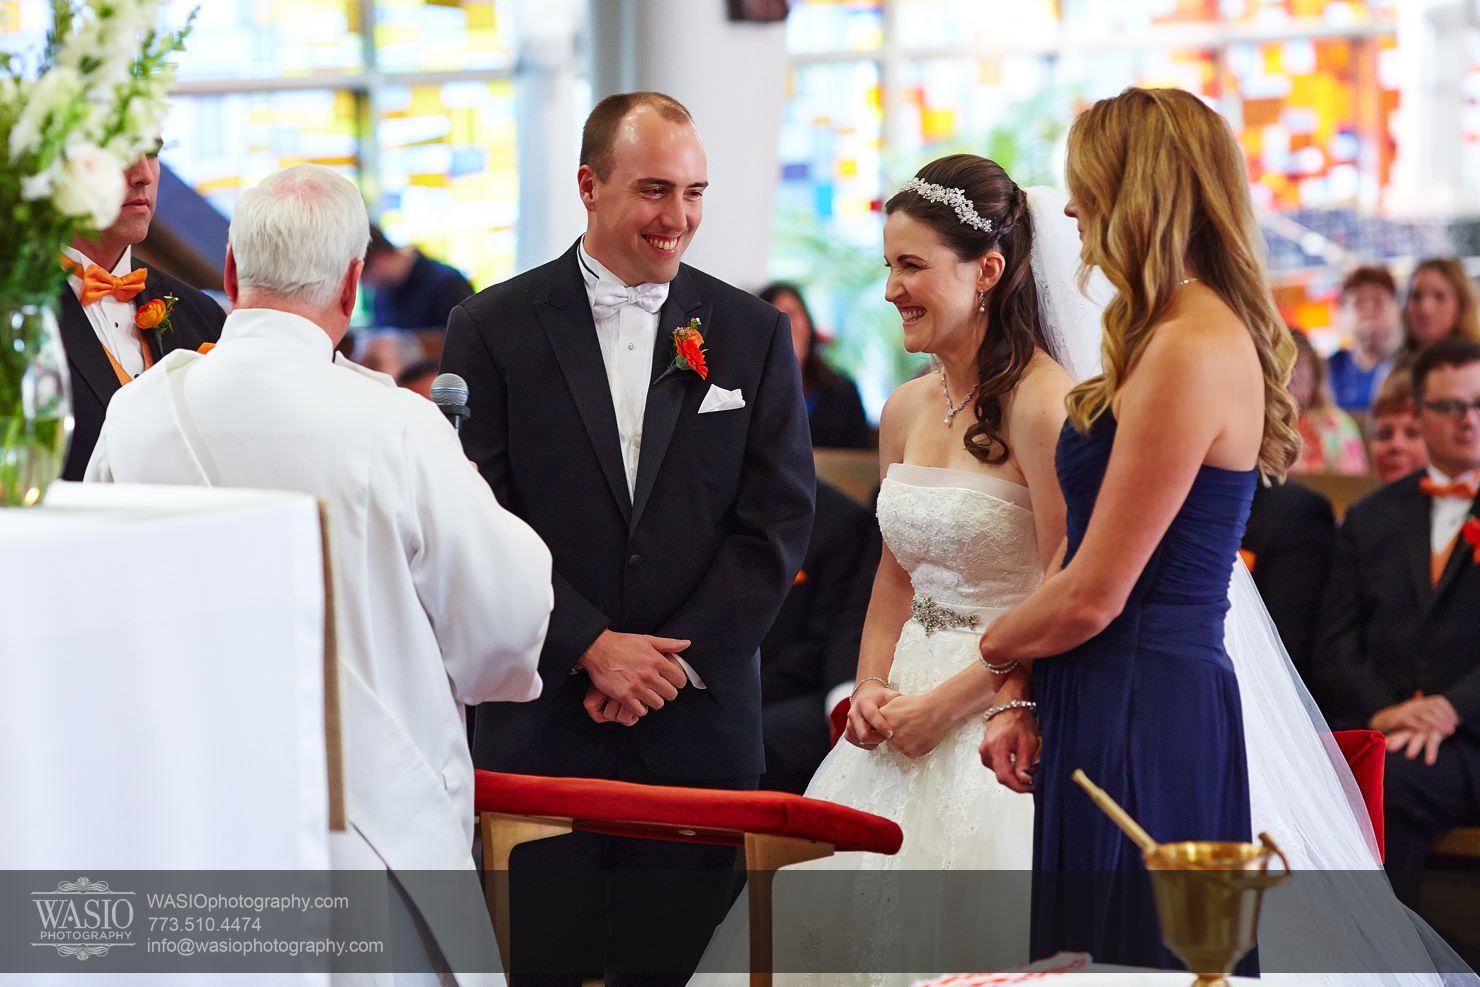 Rosemont-Fall-Wedding-Lauren-and-David-015 Rosemont Fall Wedding - Lauren + David